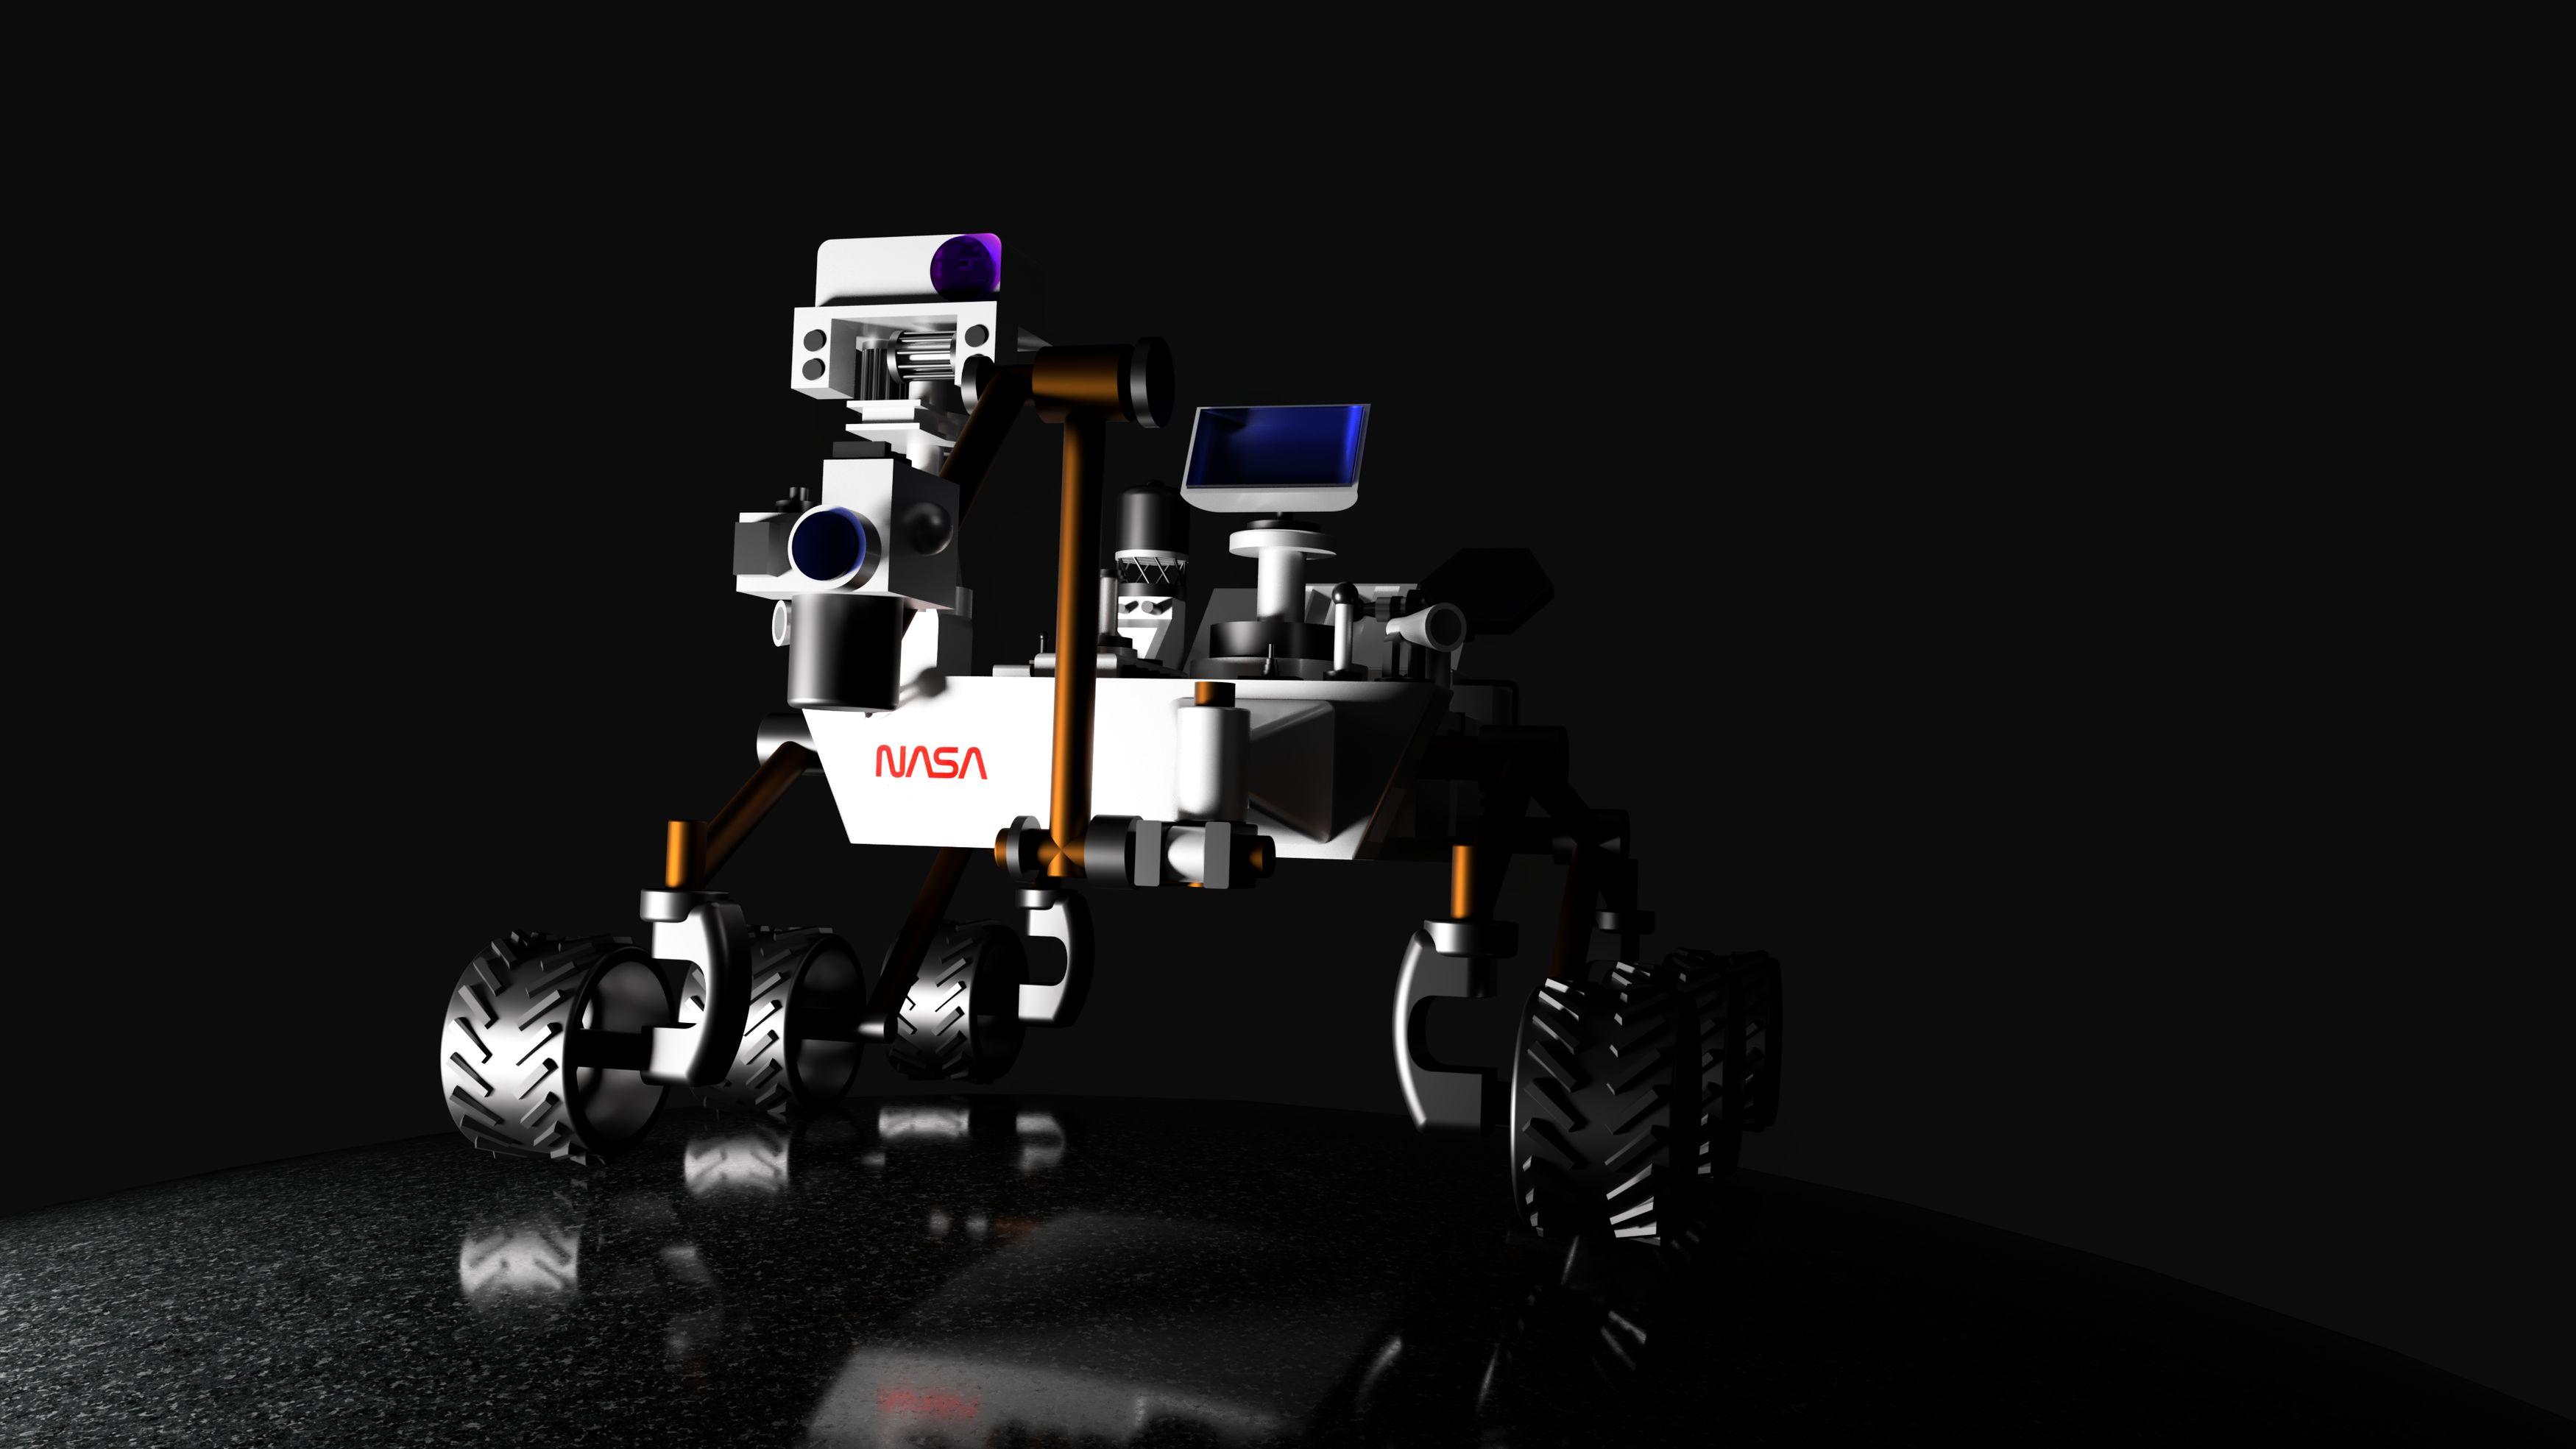 Robot-space-nasa---lcs2020-2020-may-06-10-49-31pm-000-customizedview9870331198-png-3500-3500